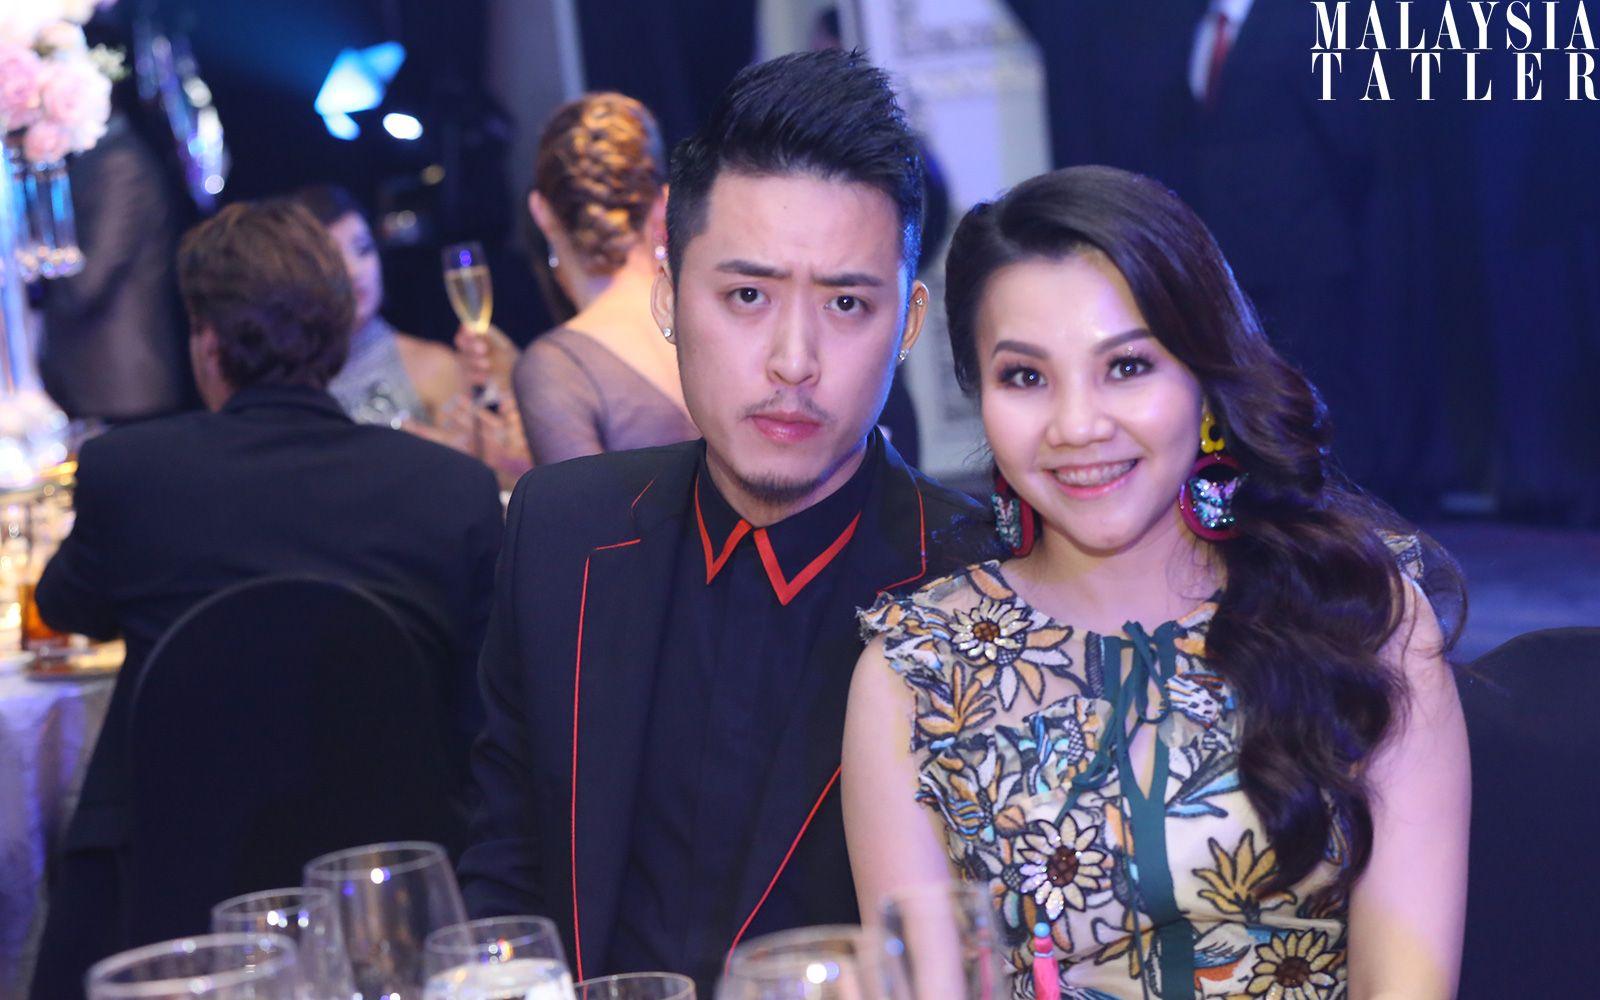 Bryan Loo and Sally Quah